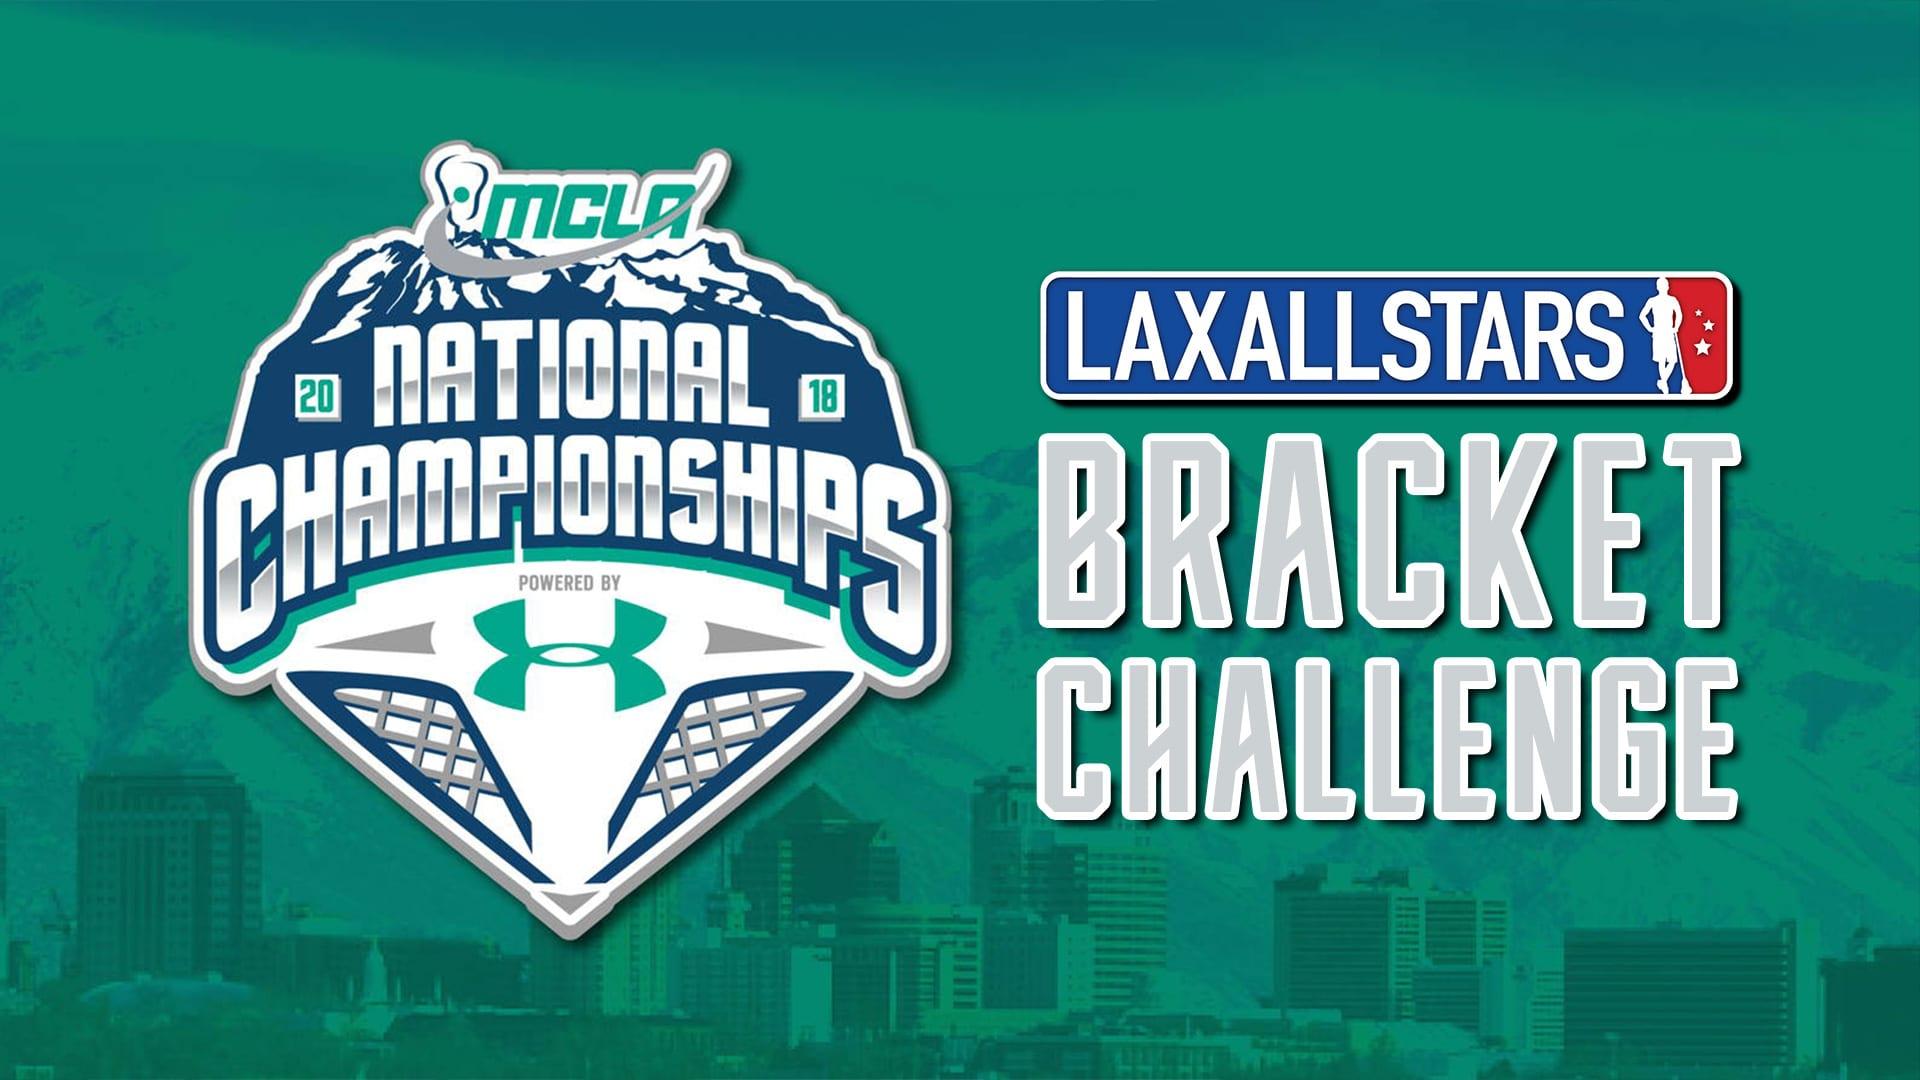 mcla championships bracket challenge